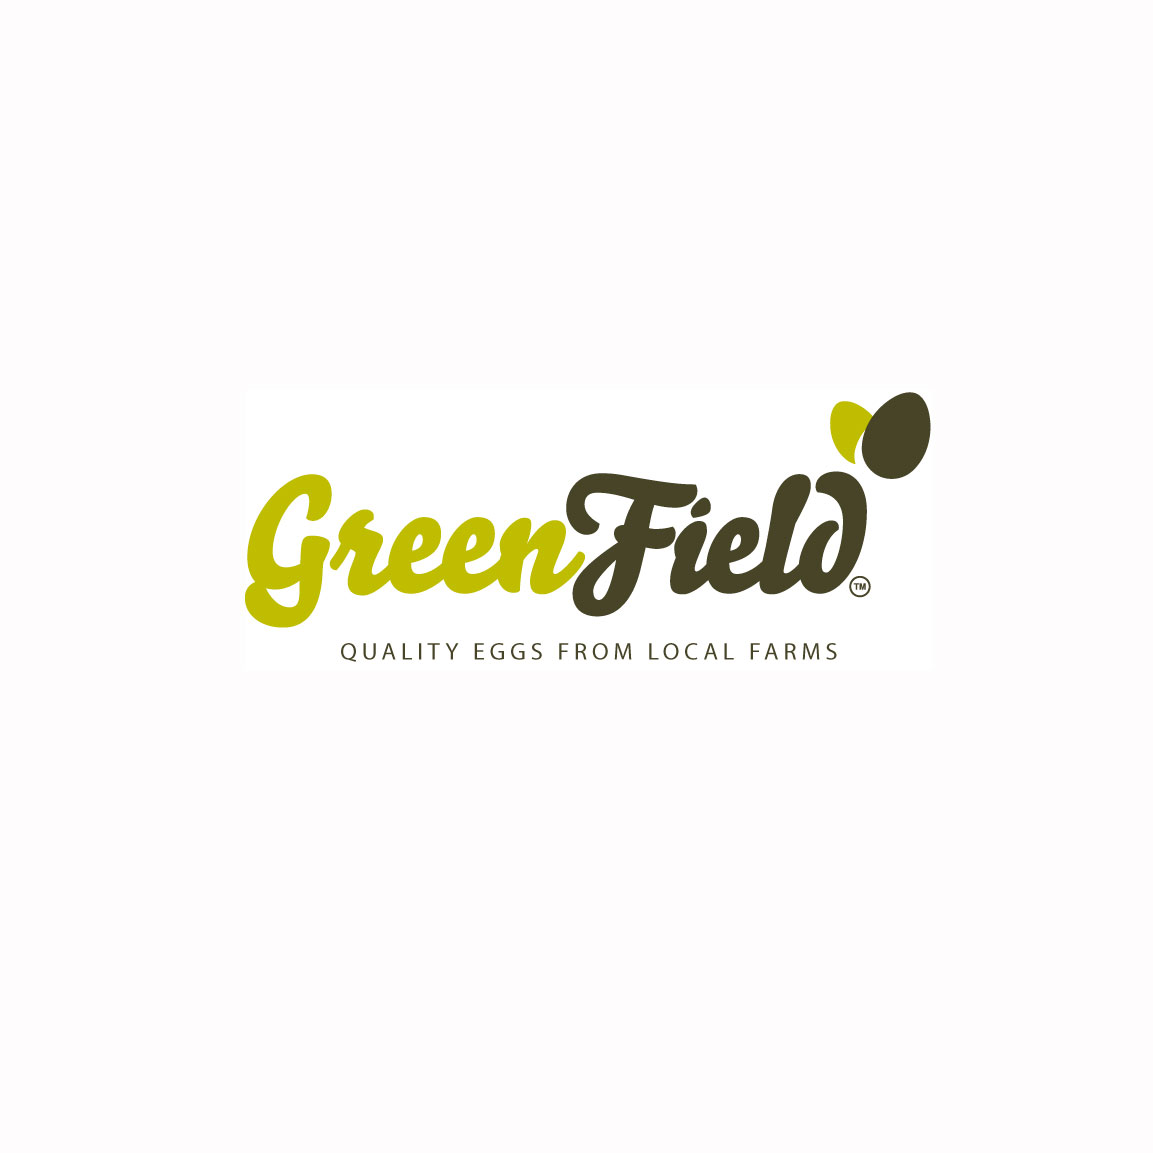 Image of Greenfield Foods Ltd logotype